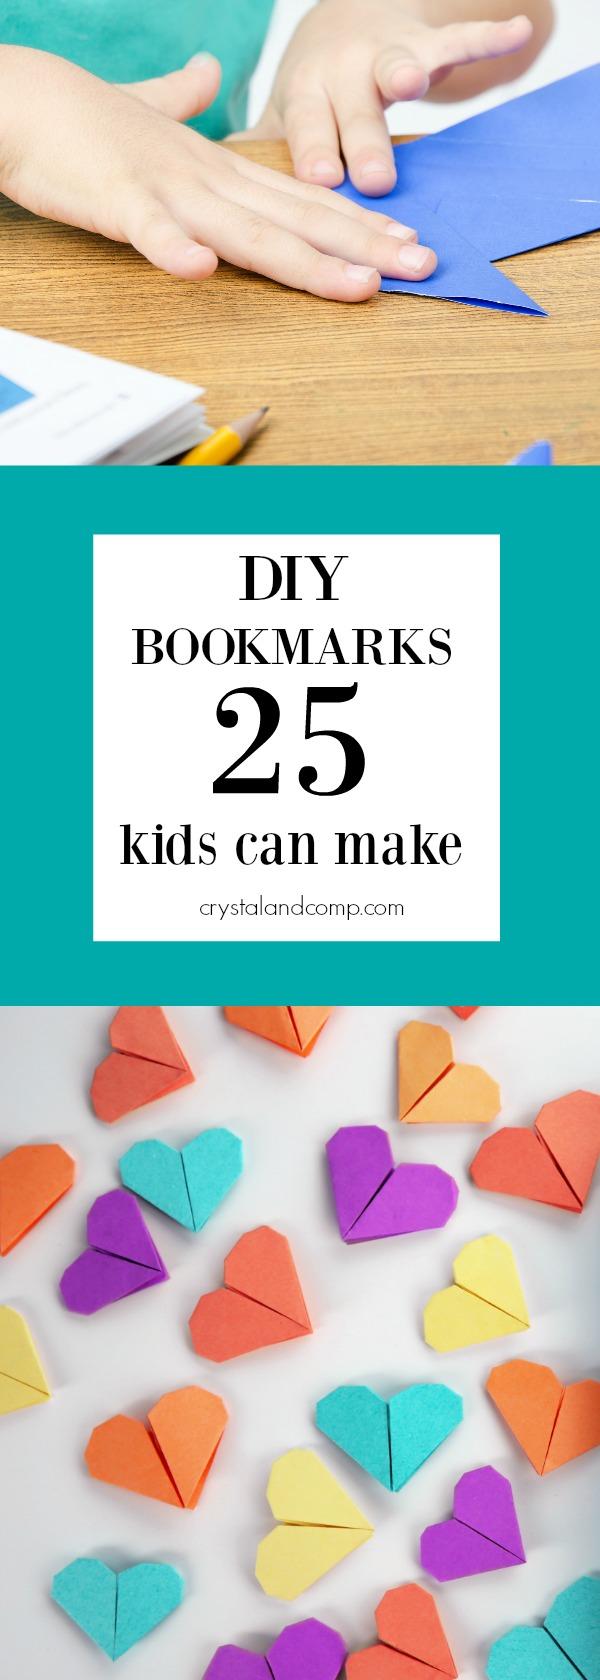 Diy Bookmark Ideas